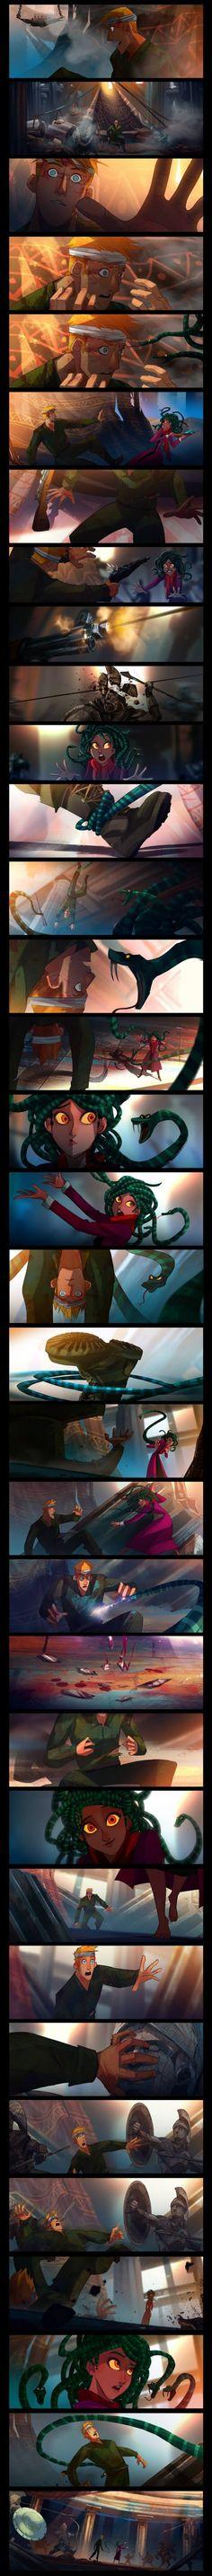 Medusa (Part 2)